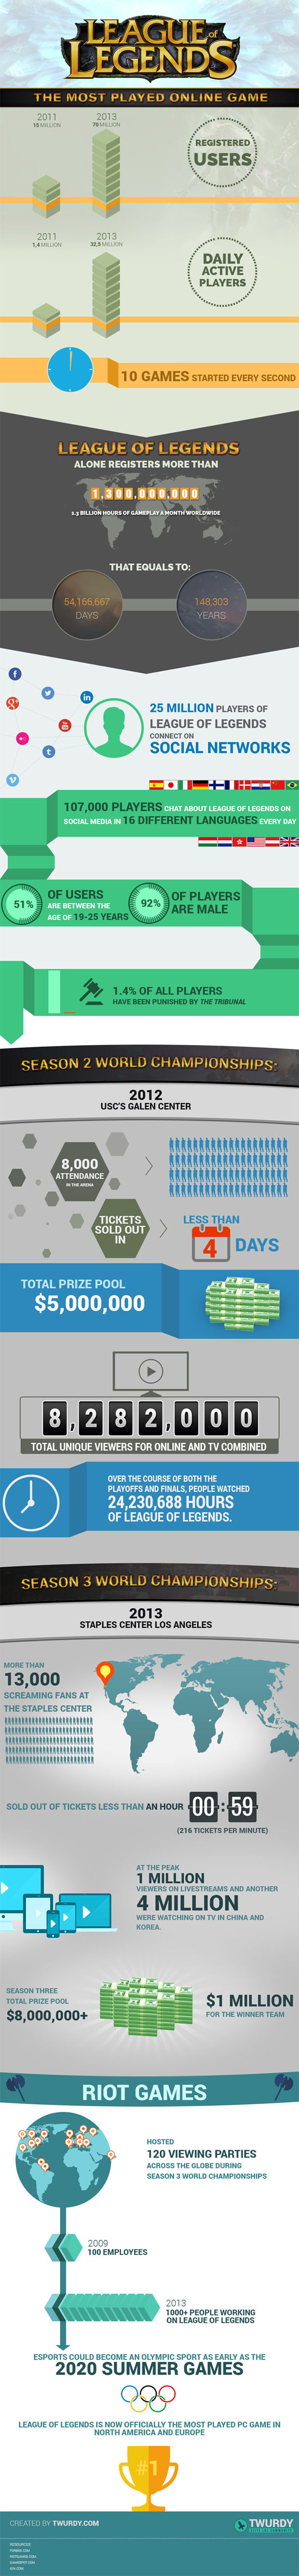 league-of-legends-infographic